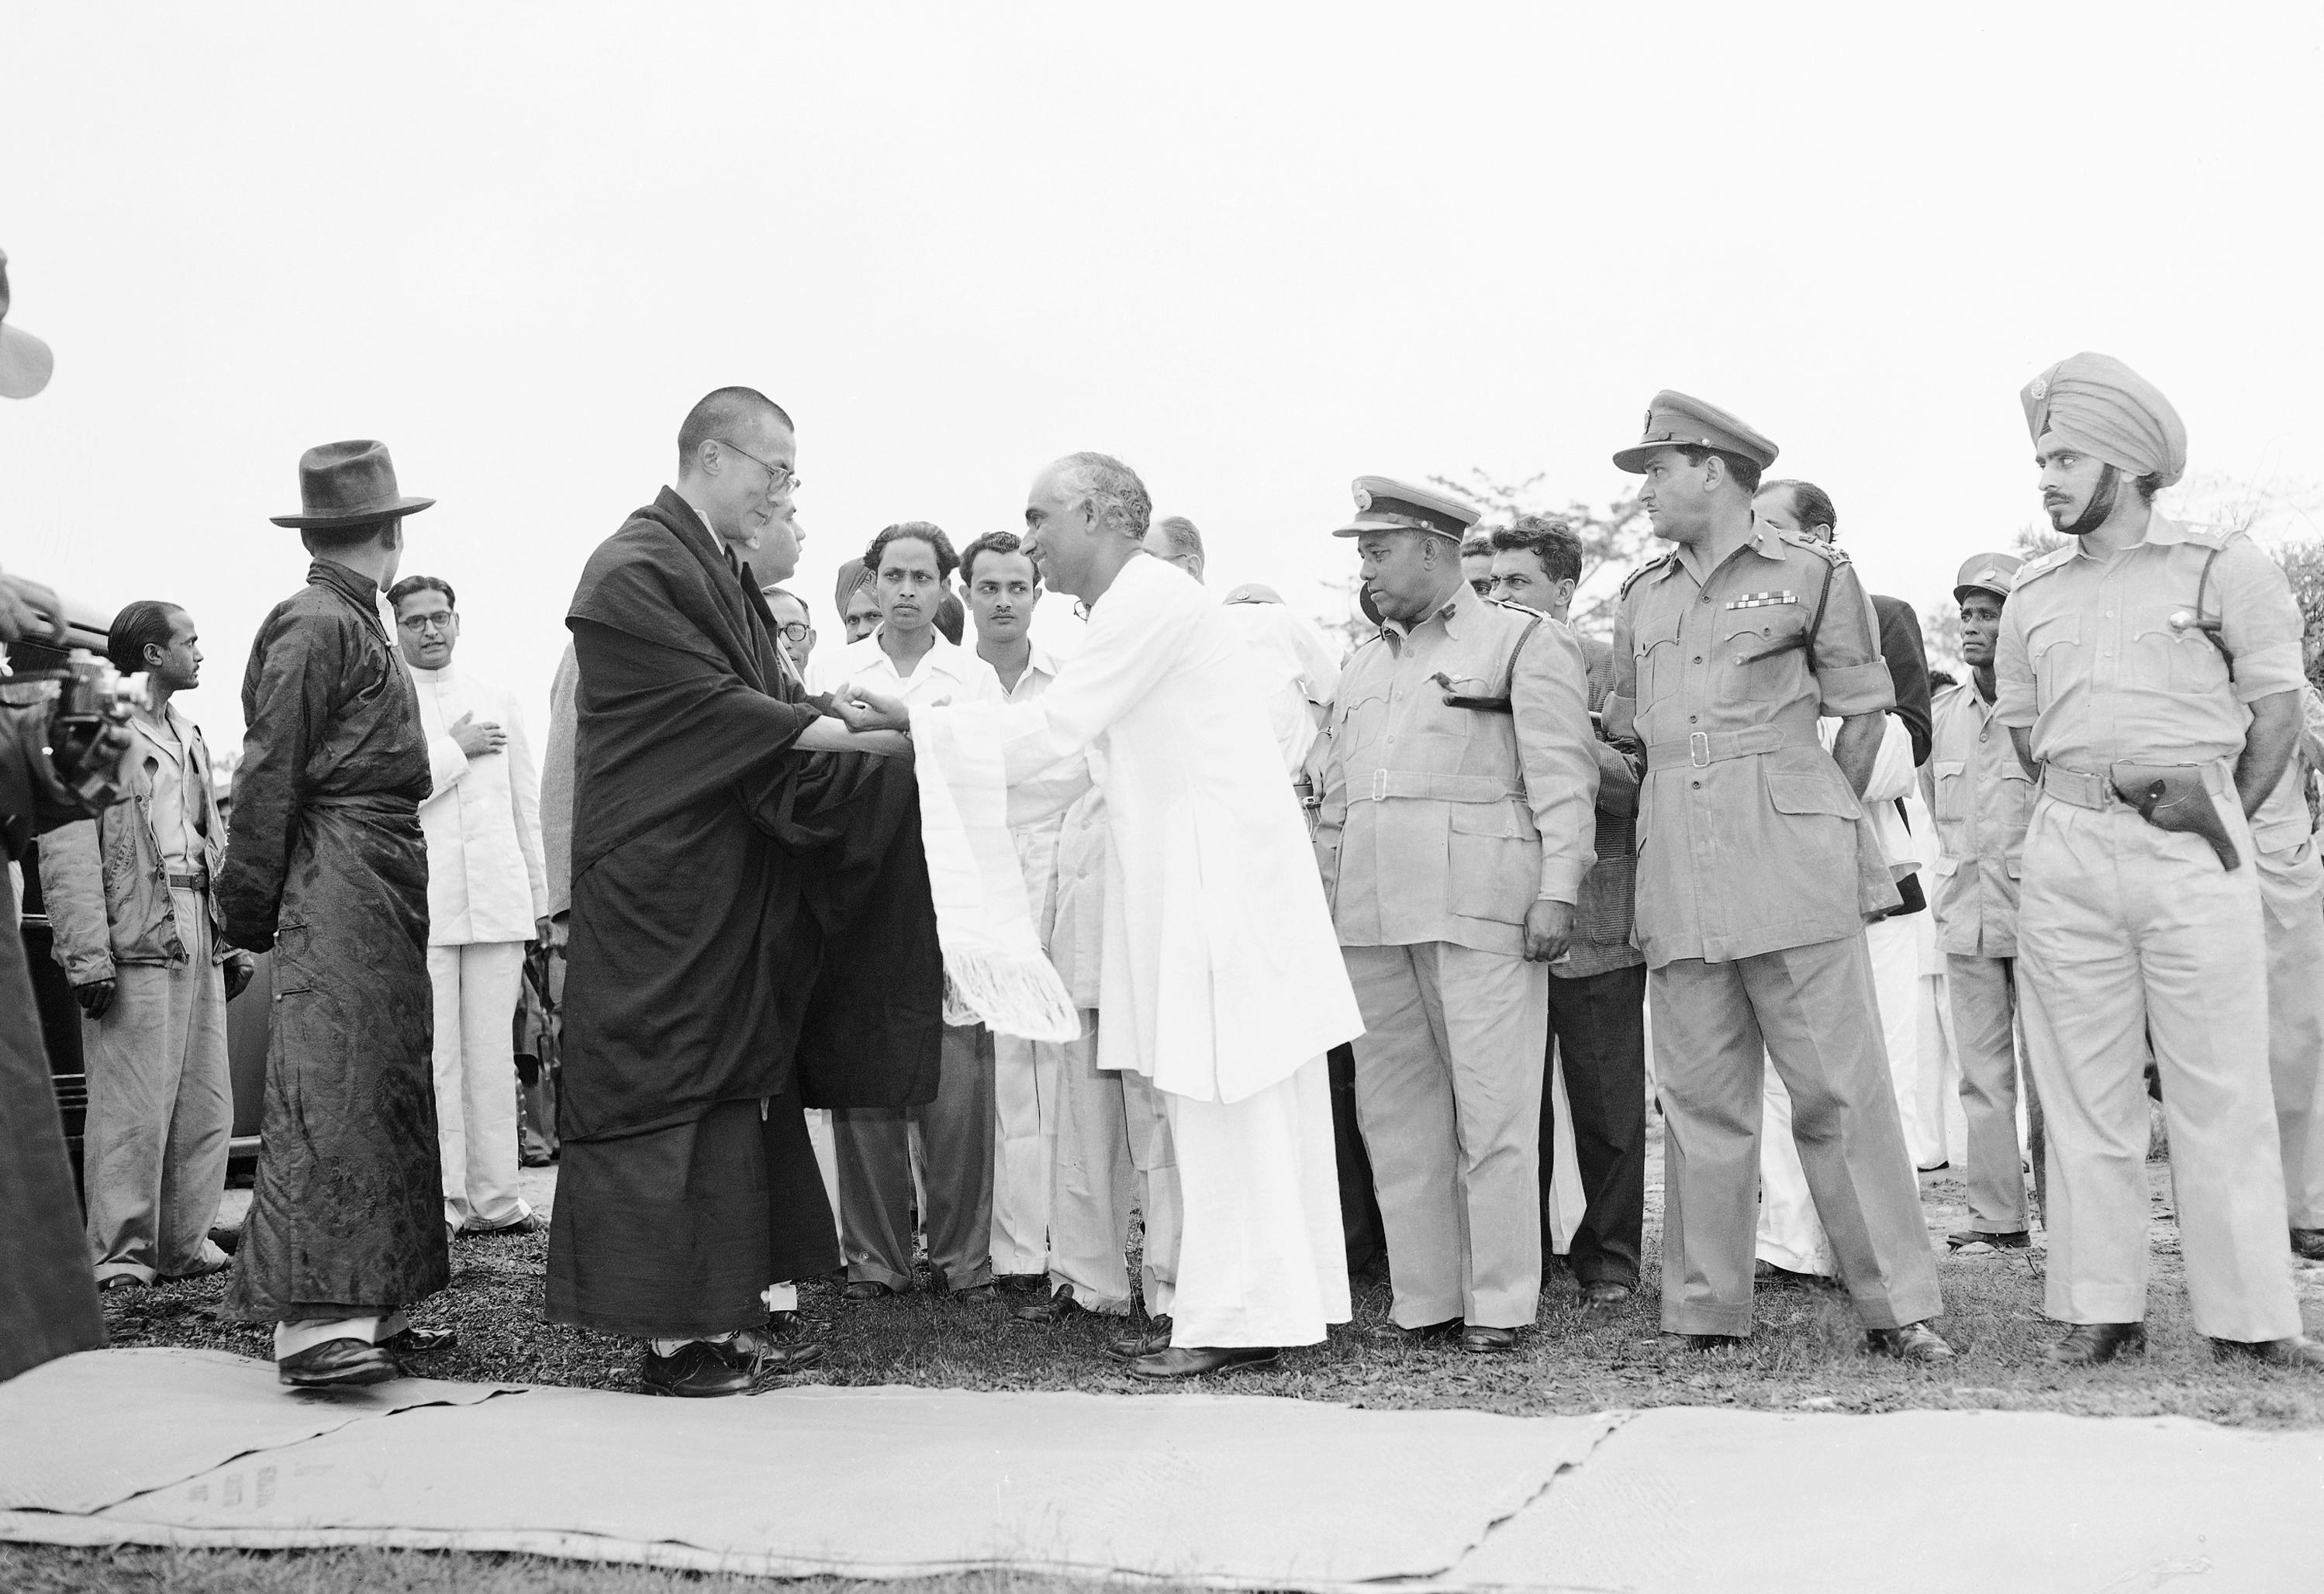 Dalai Lama Welcomed to Assam